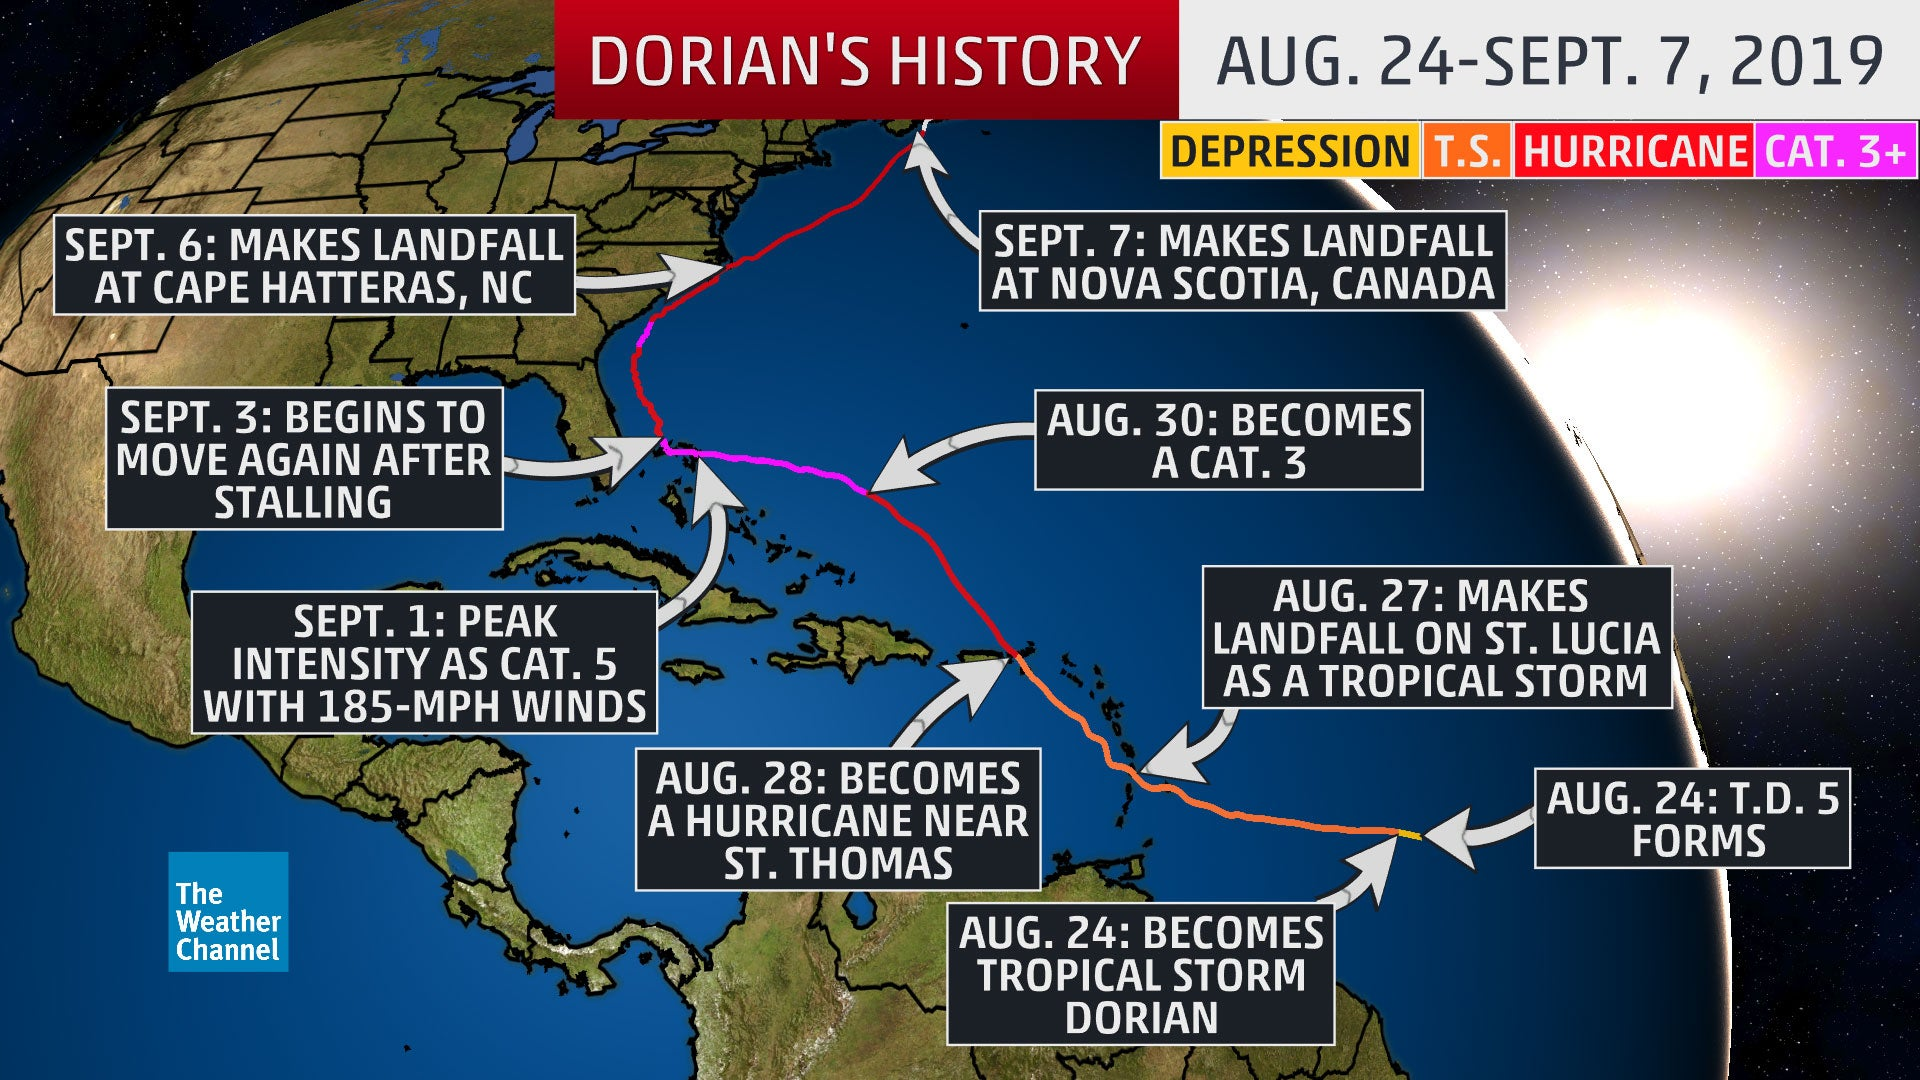 Hurricane Dorian Ravaged The Bahamas And Struck The